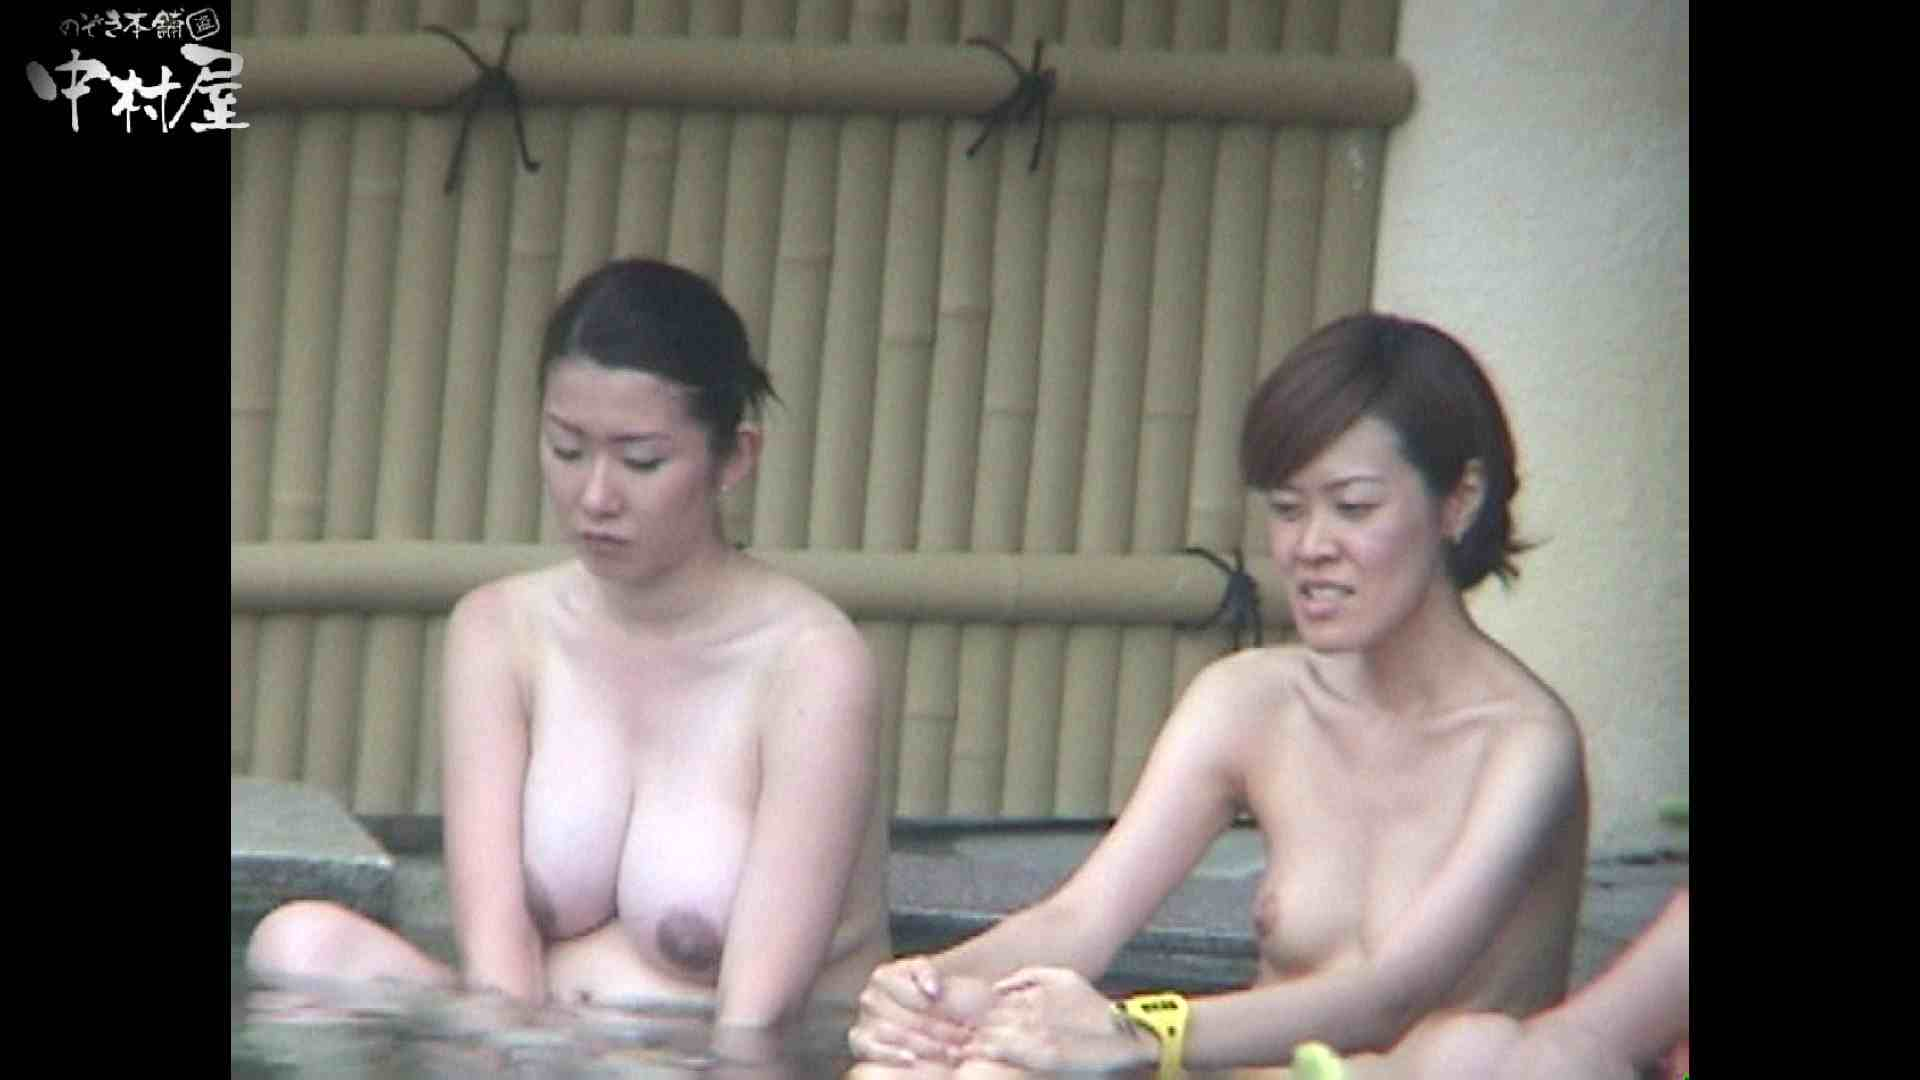 Aquaな露天風呂Vol.961 OLセックス | 盗撮  86画像 19